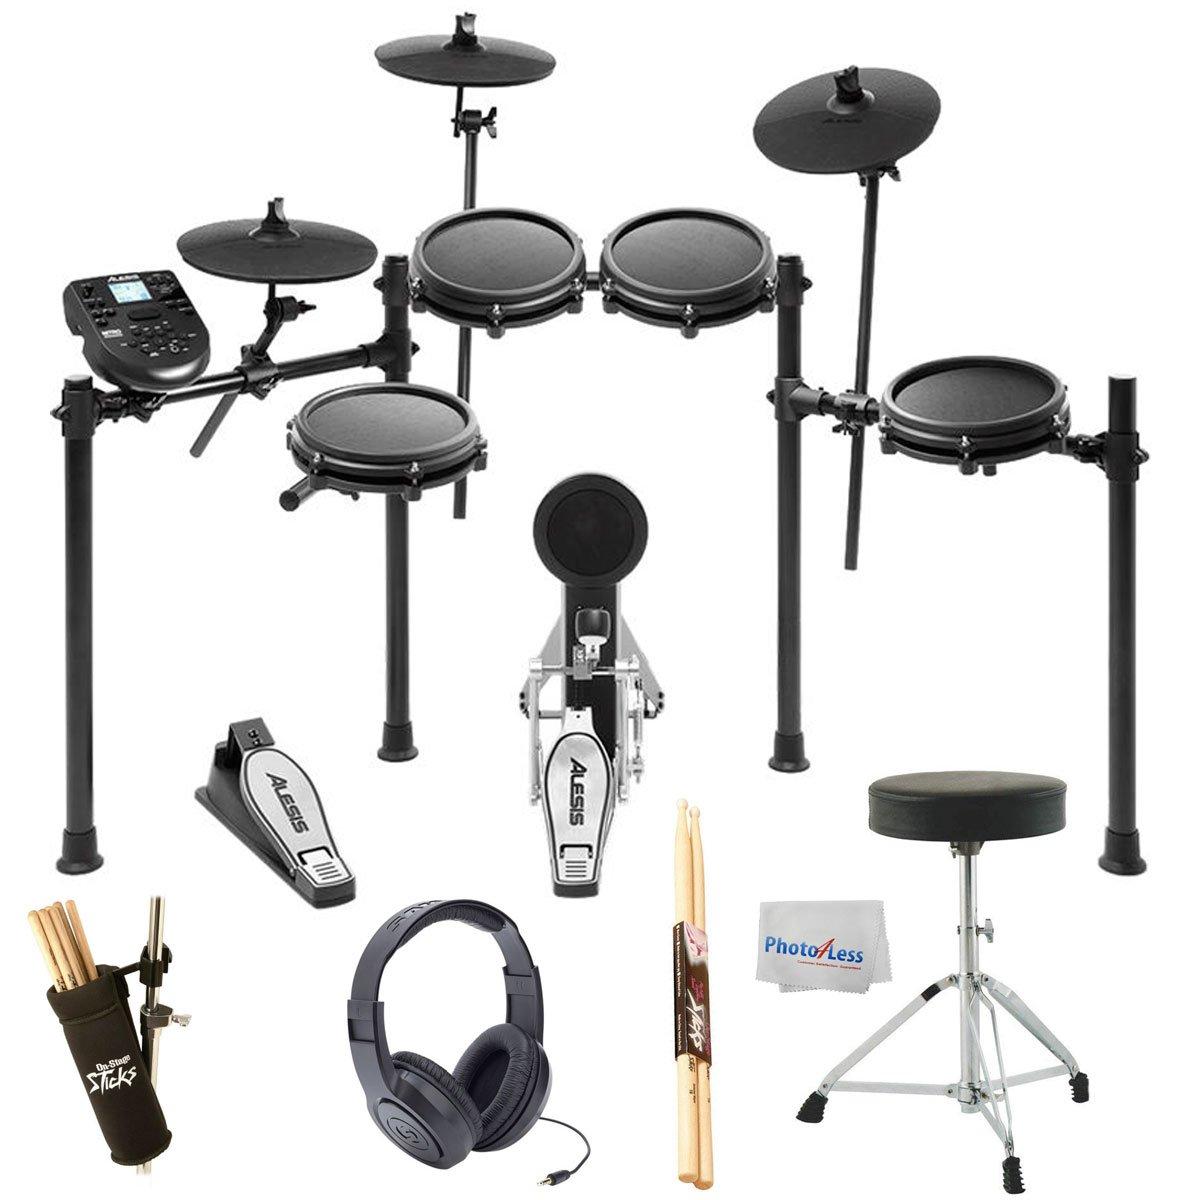 Alesis Nitro Mesh Electronic Drum Kit + Samson SR350 Studio Headphones + On Stage Drum Stick Holder DA100 + Braced Drum Throne + Maple Wood 5B Drumsticks - Photo4Less Clean Cloth- Top Accessory Bundle by Alesis